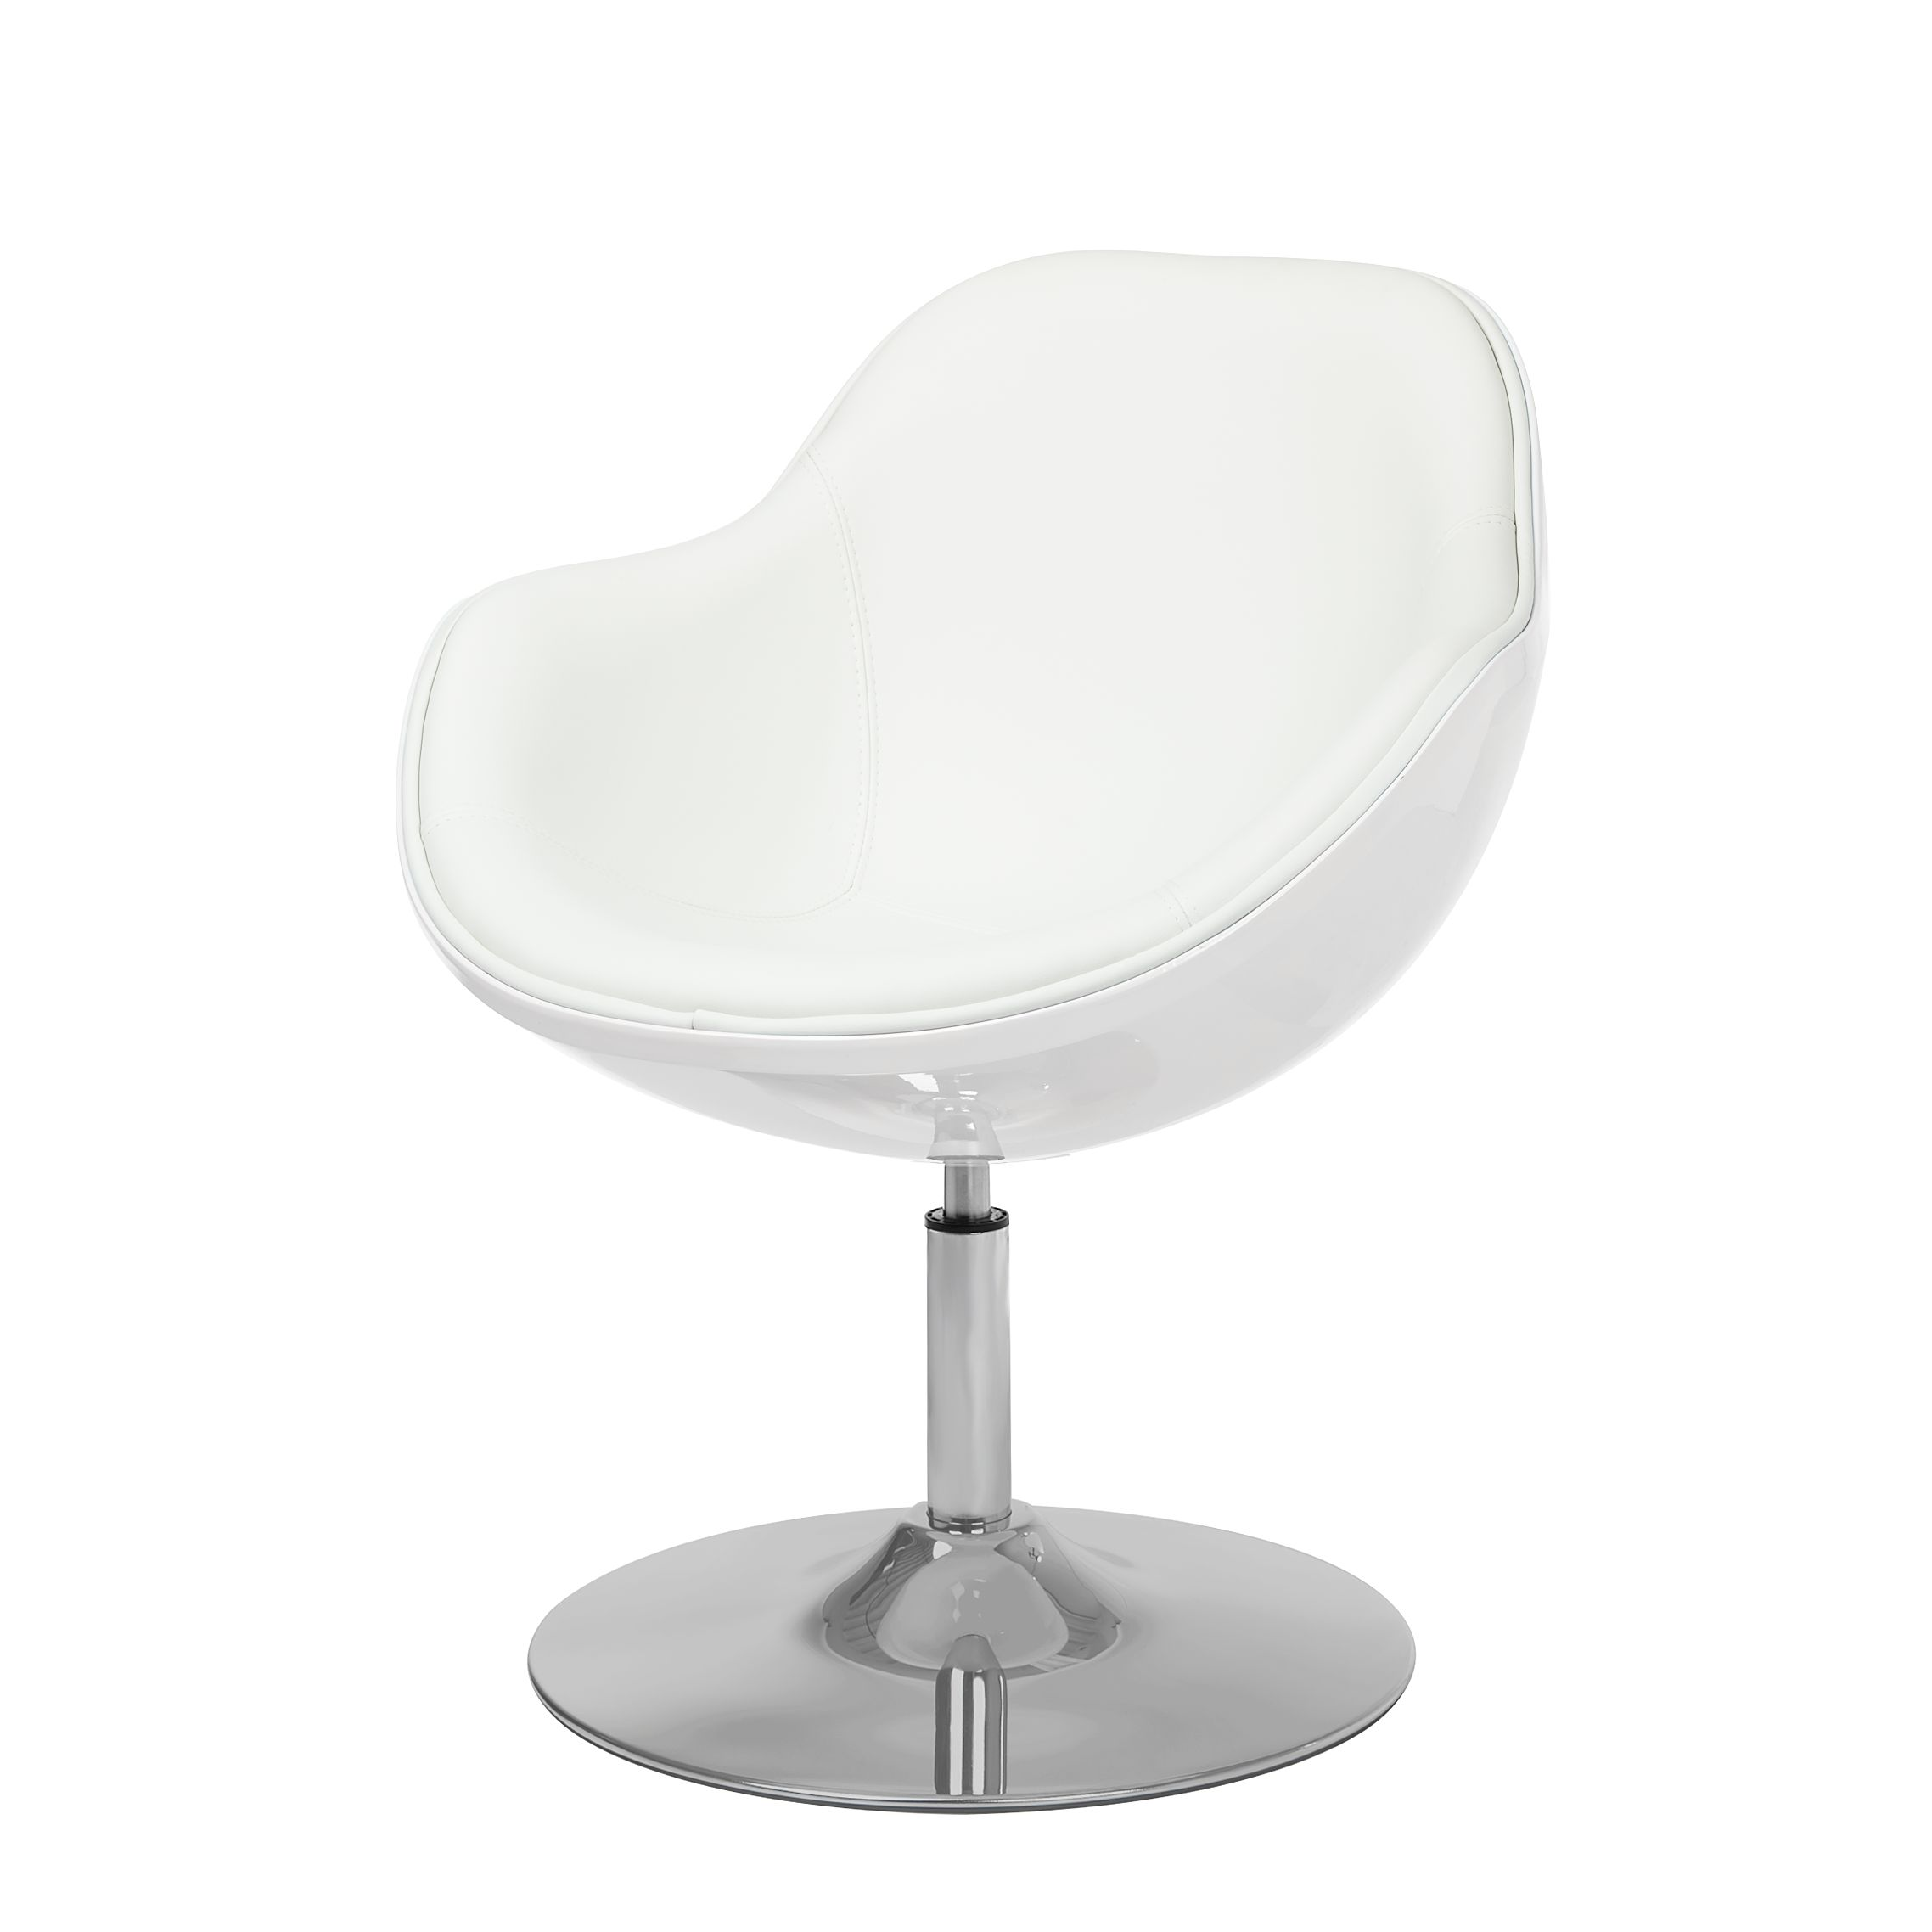 Poltrona Cartago - Materiale sintetico/Similpelle Bianco - Similpelle Veli Bianco II, Fredriks